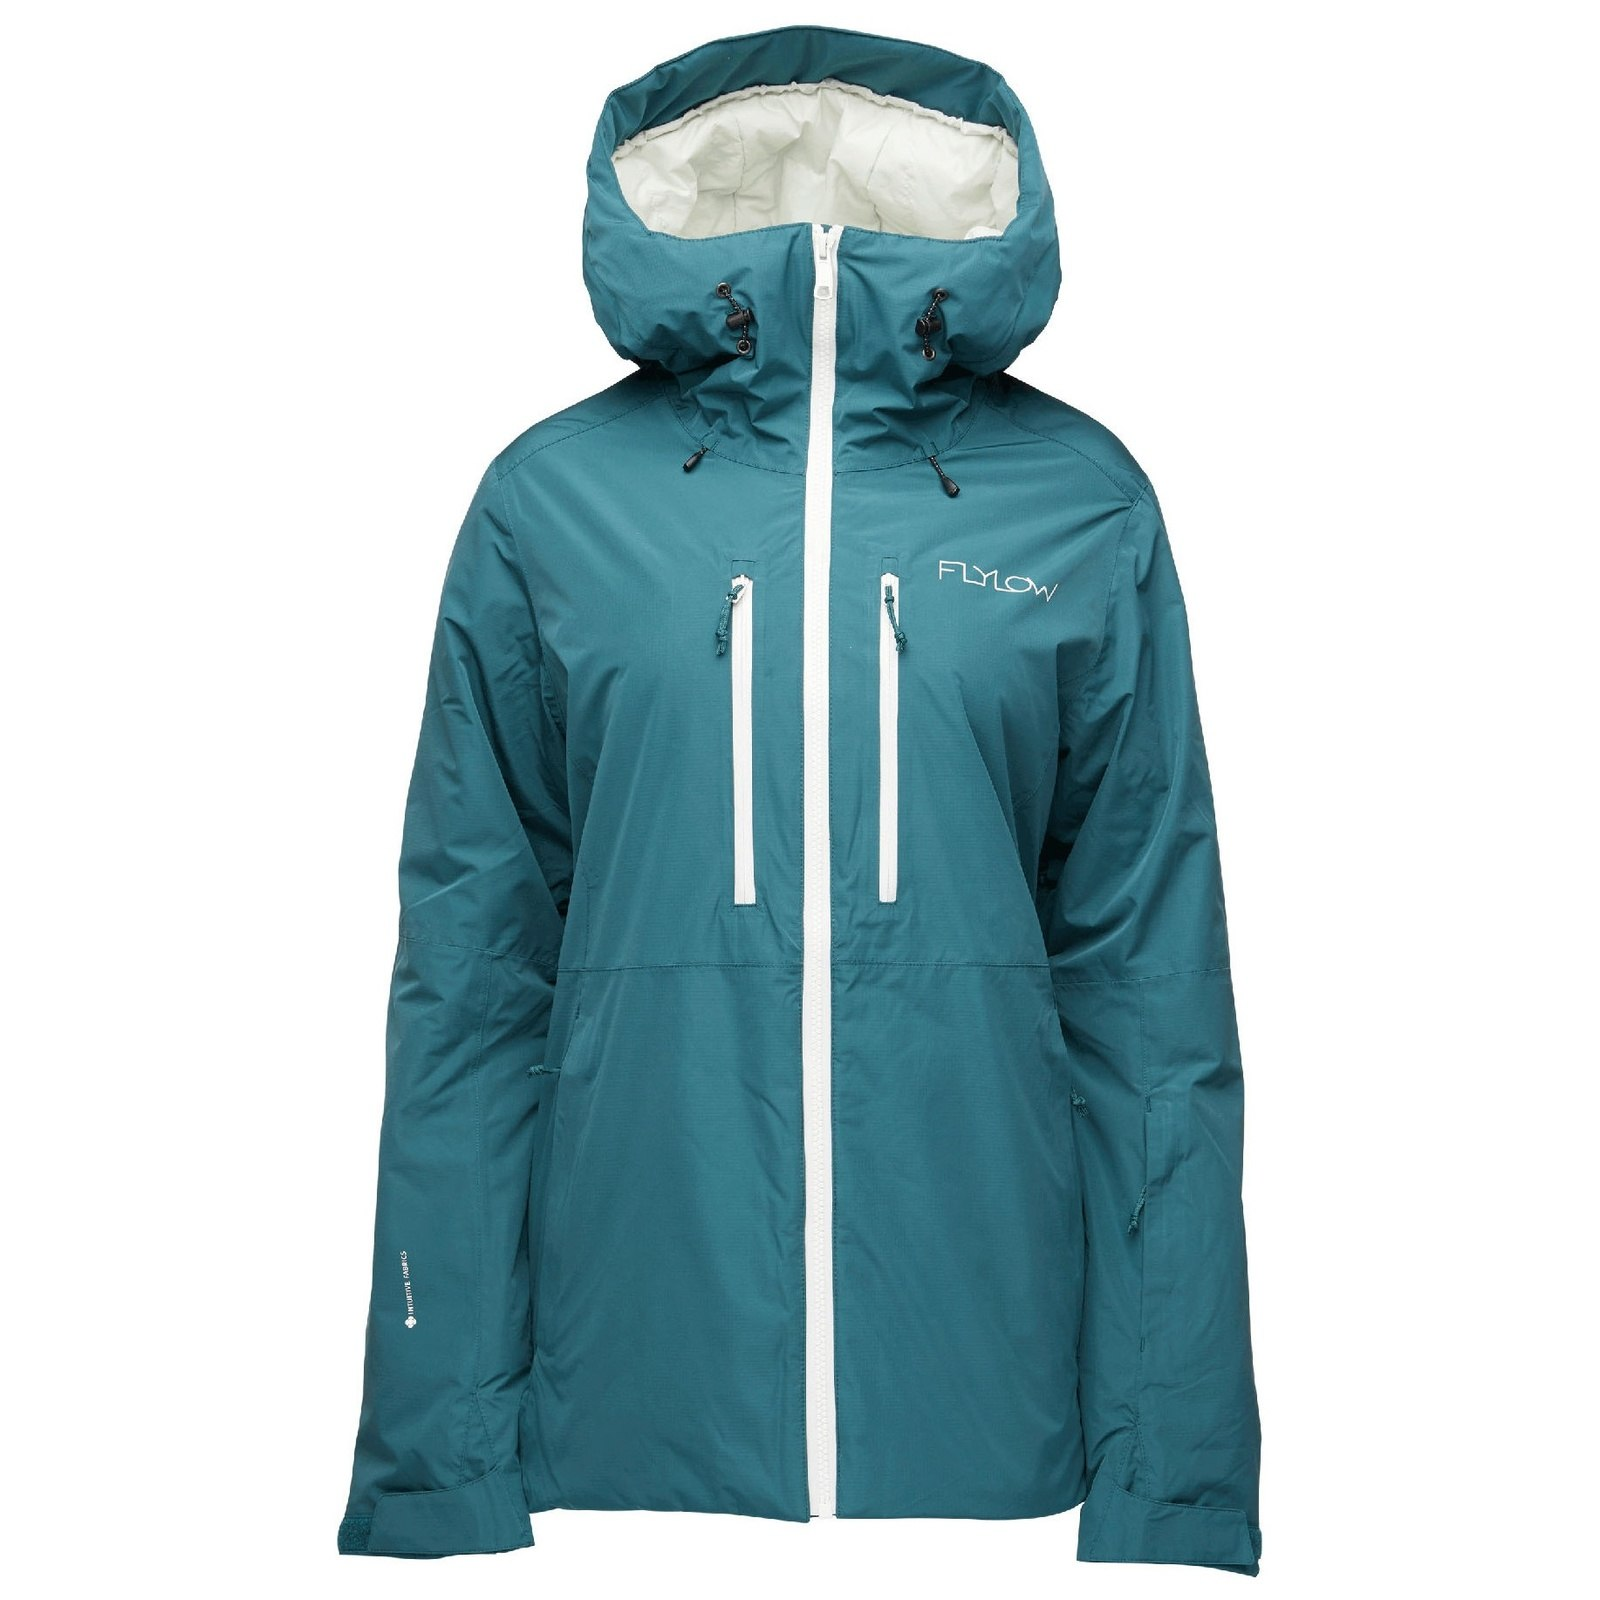 Women's Flylow Avery Ski Jacket